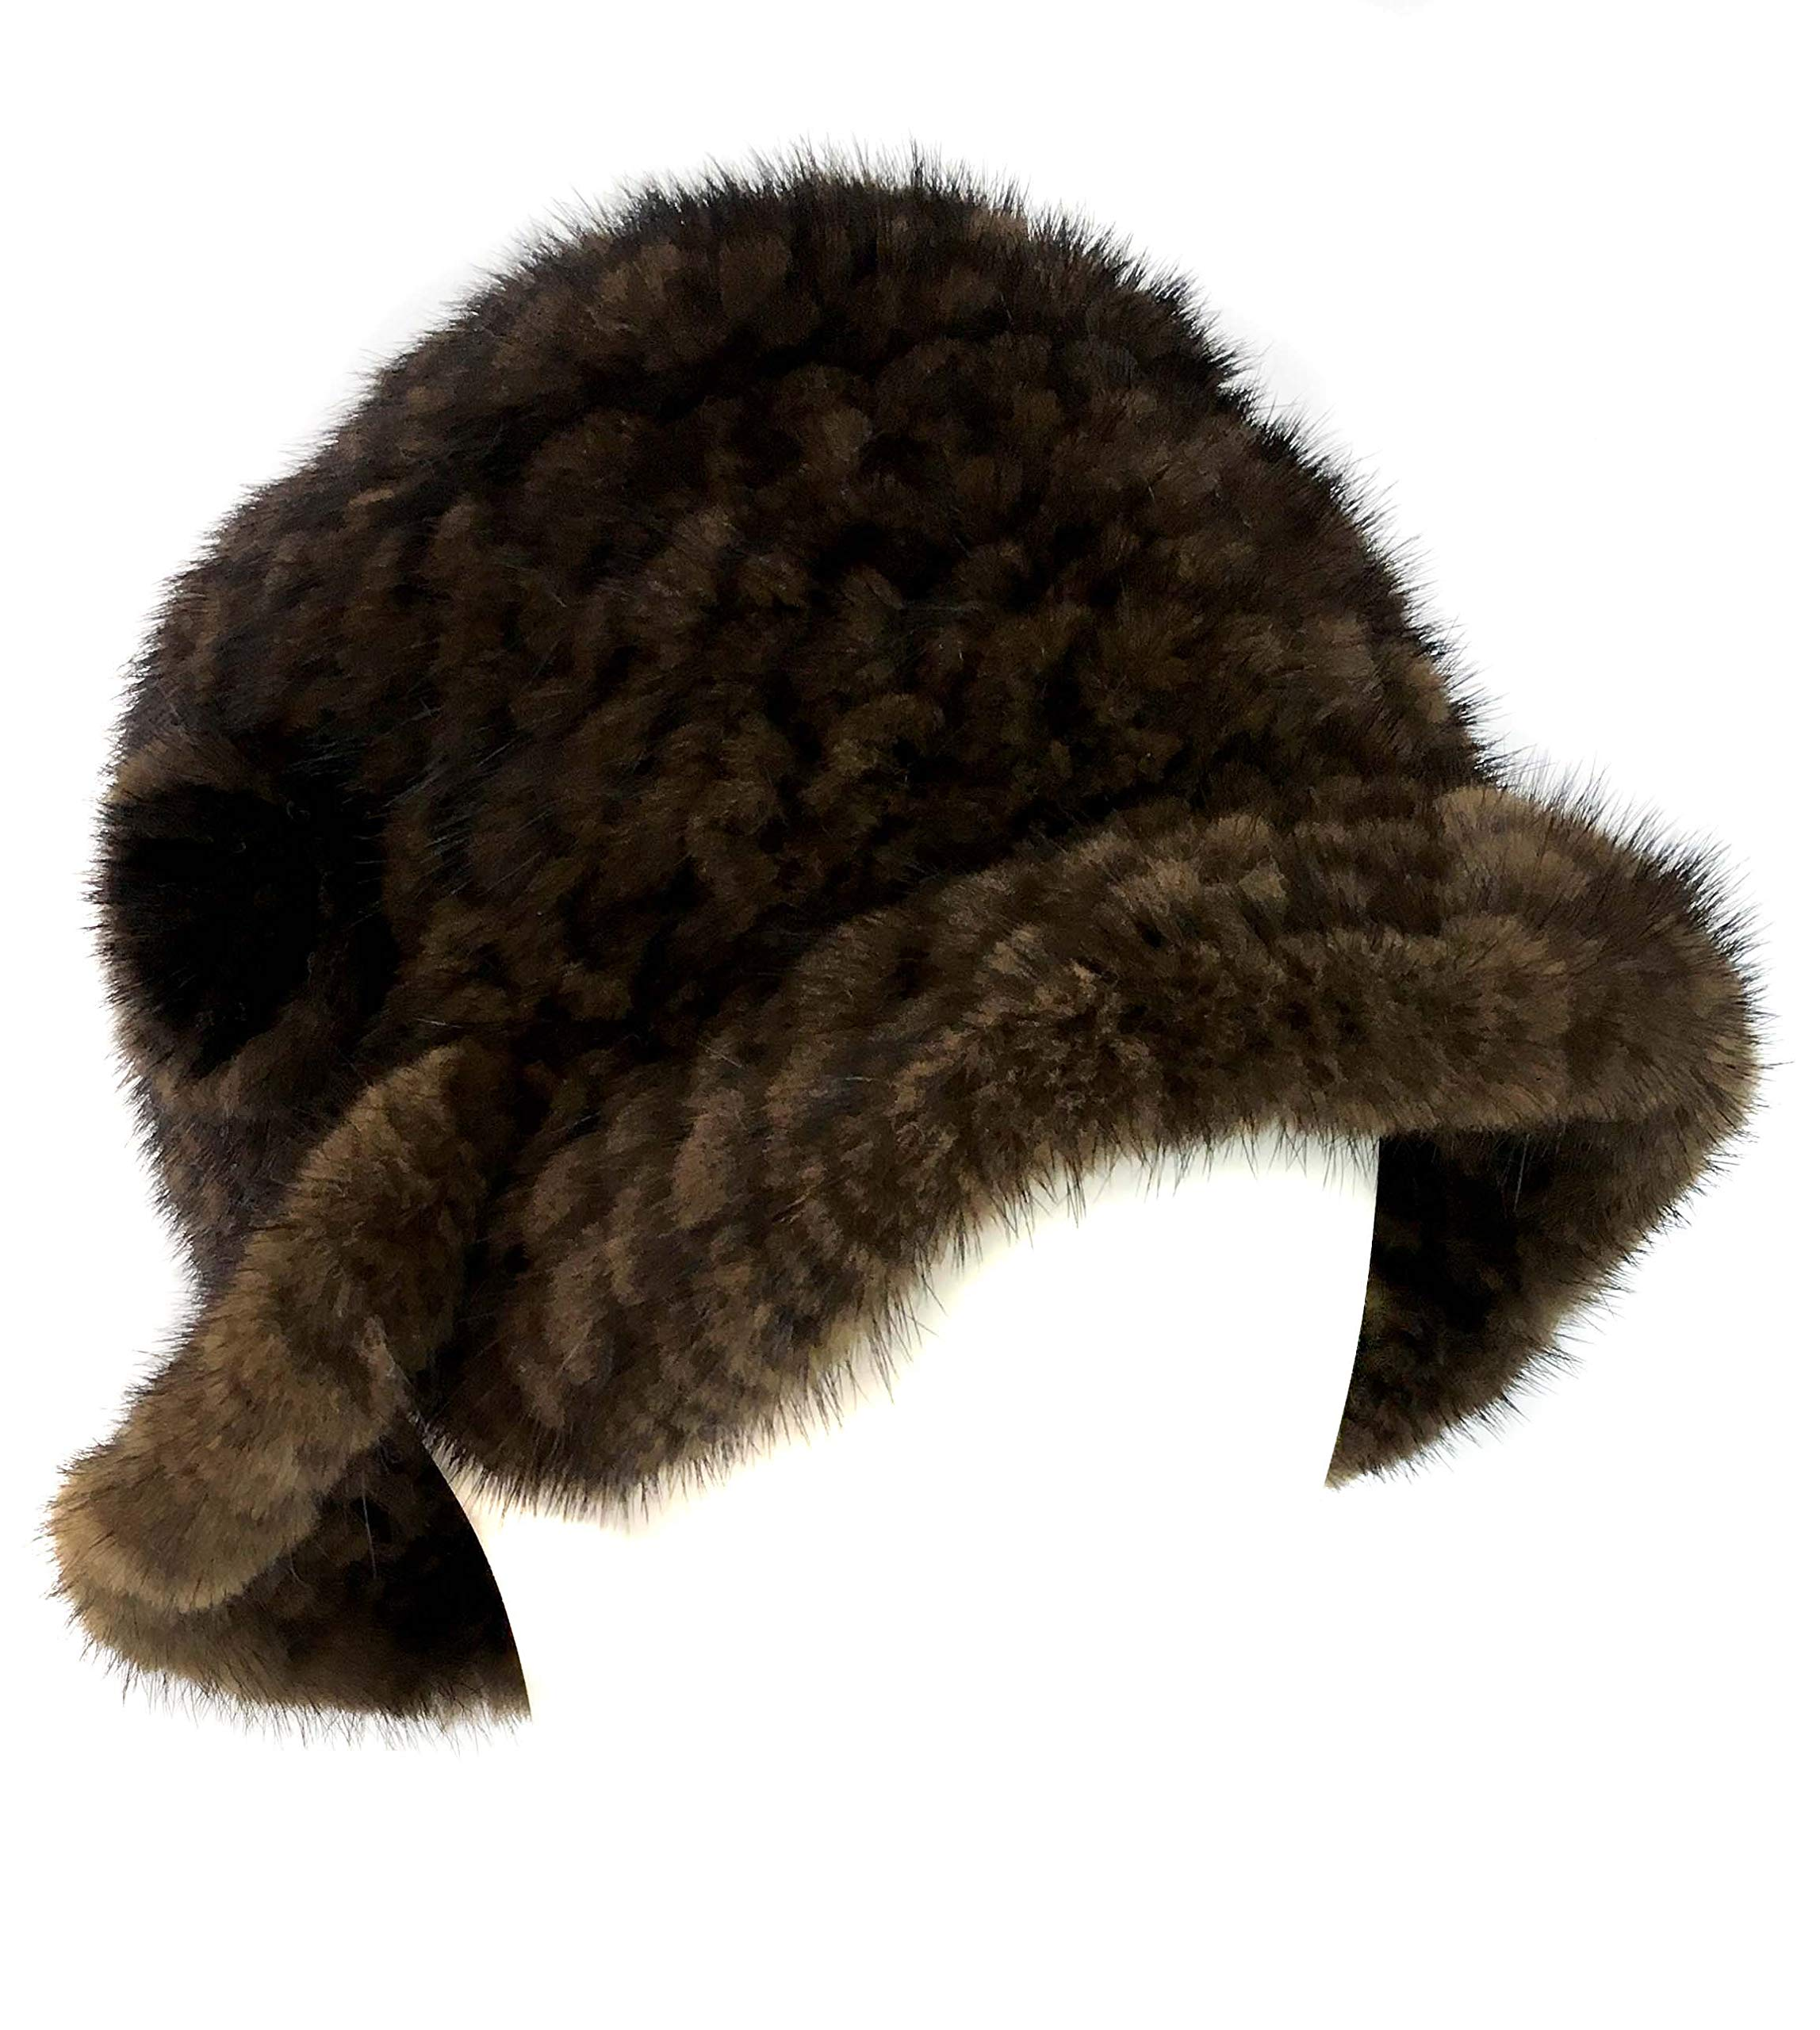 surell Mink Cloche Knit Hat - Real Fur Bell Flapper Hat - Bridal Wedding Attire Brown